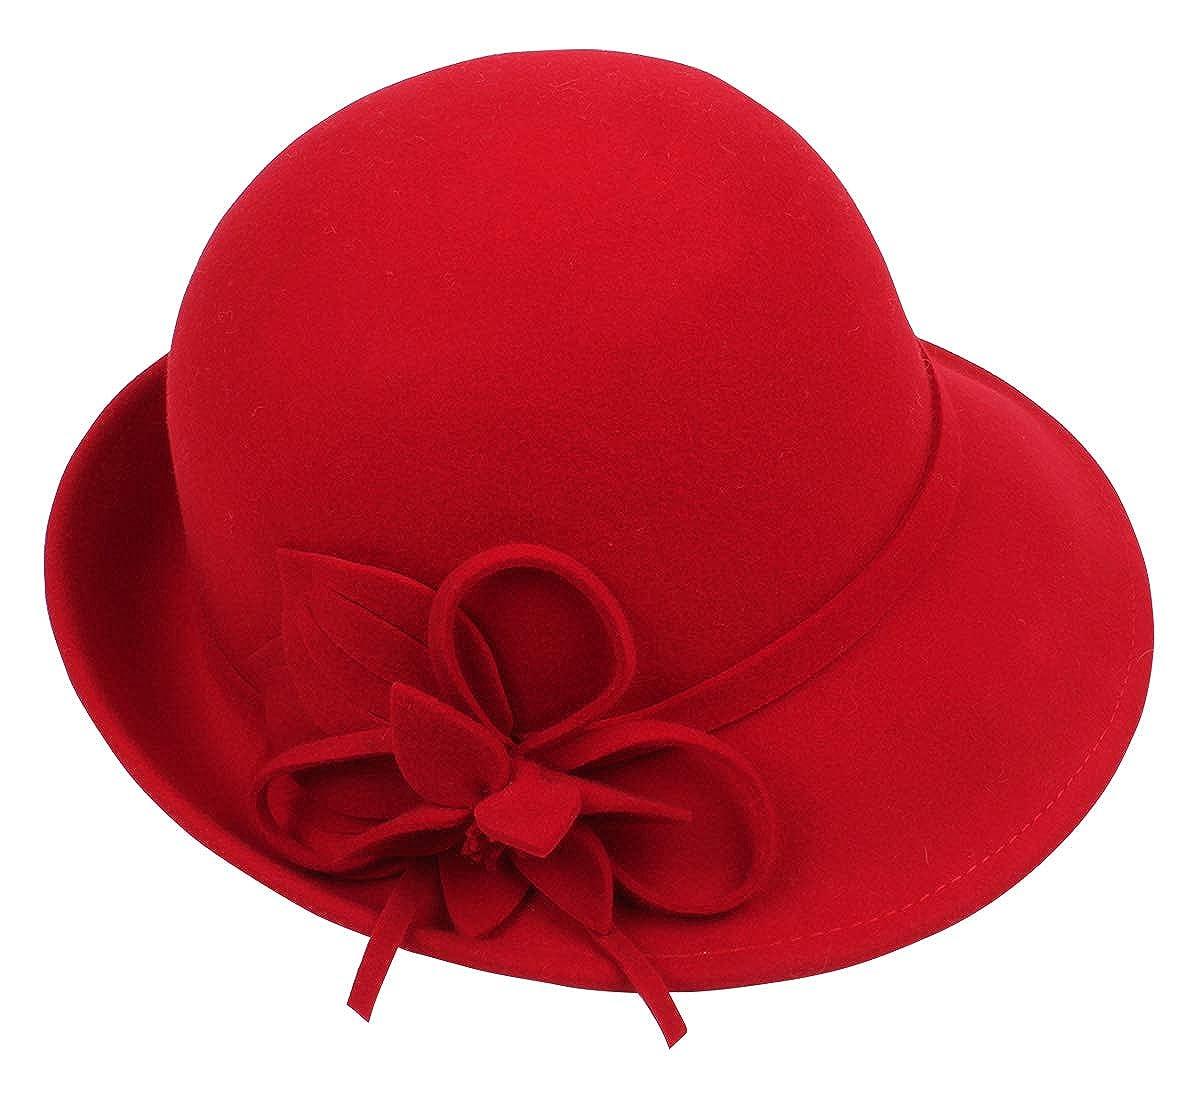 FEOYA Women Vintage Retro Felt Bowler Hat Solid Floral Belt Cloche Bucket Hat Fedoras Caps for Party Travel OJFS1070